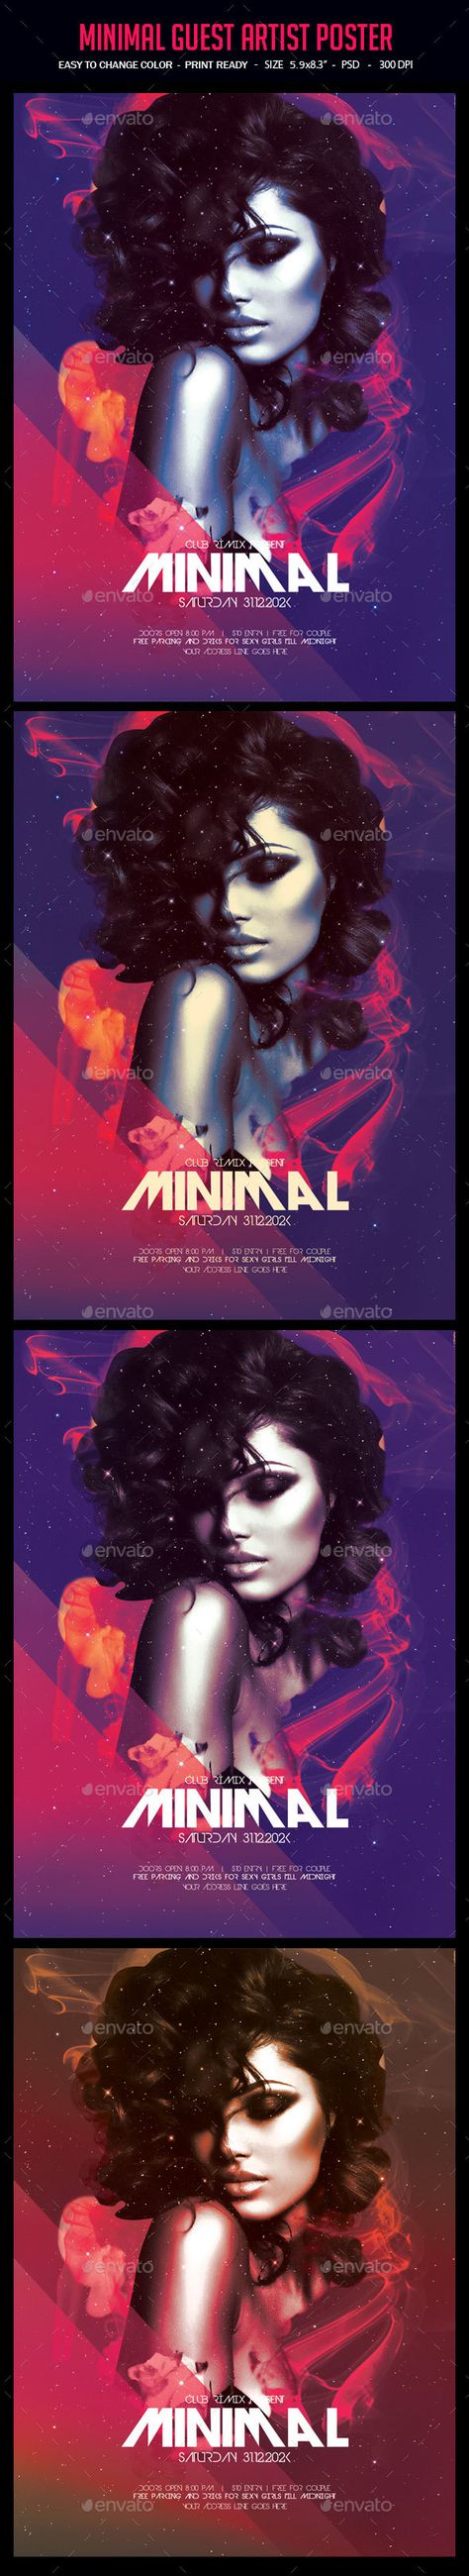 Minimal Guest Artist Poster